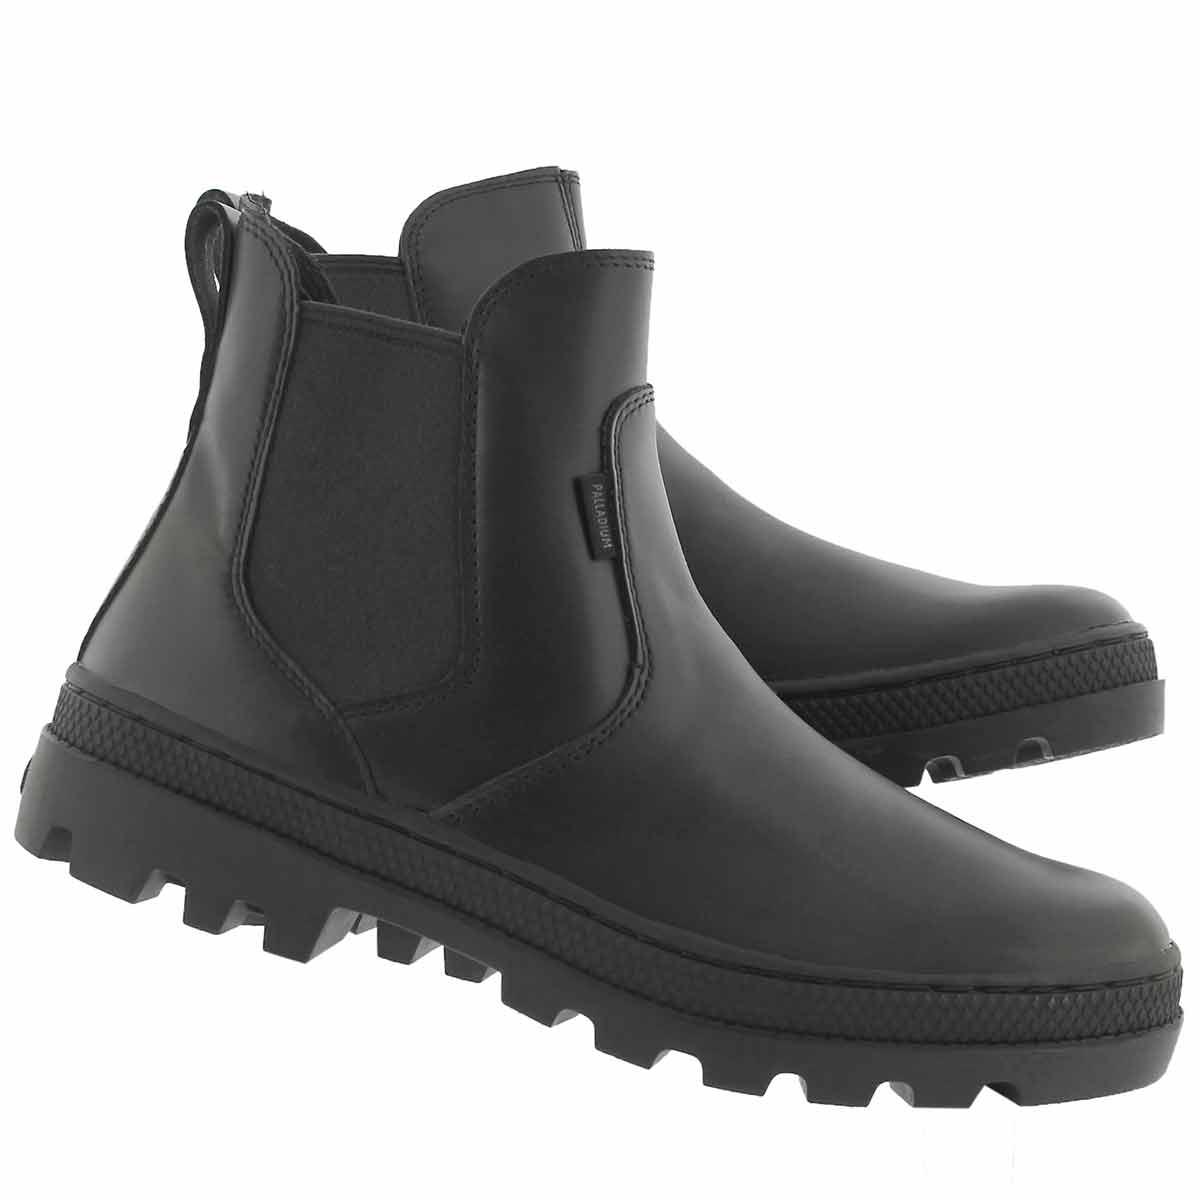 Lds Pallabosse blk chelsea boot